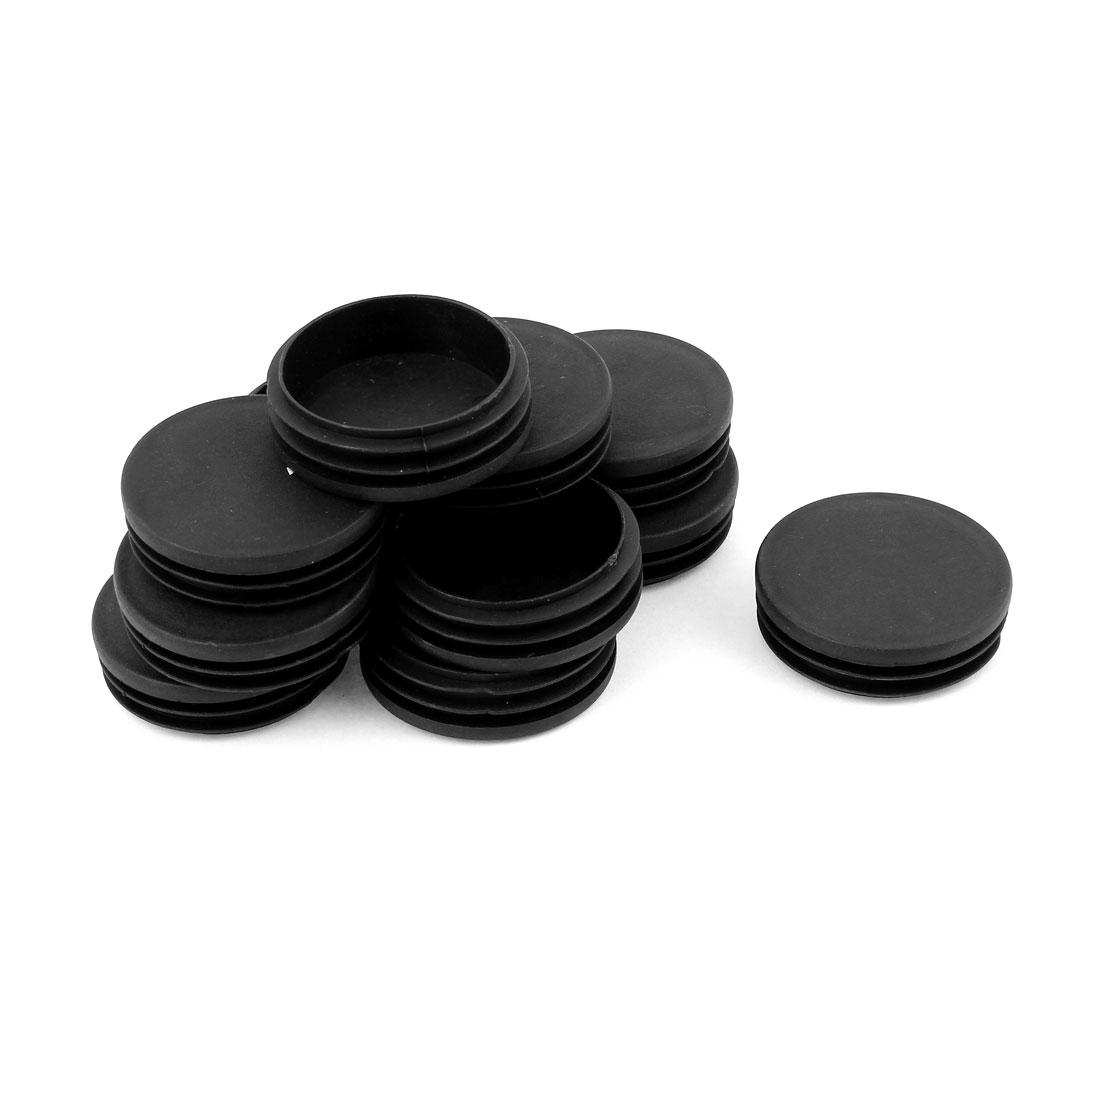 12 Pcs Plastic 60mm Dia Round Tubing Tube Insert Blanking End Caps Black